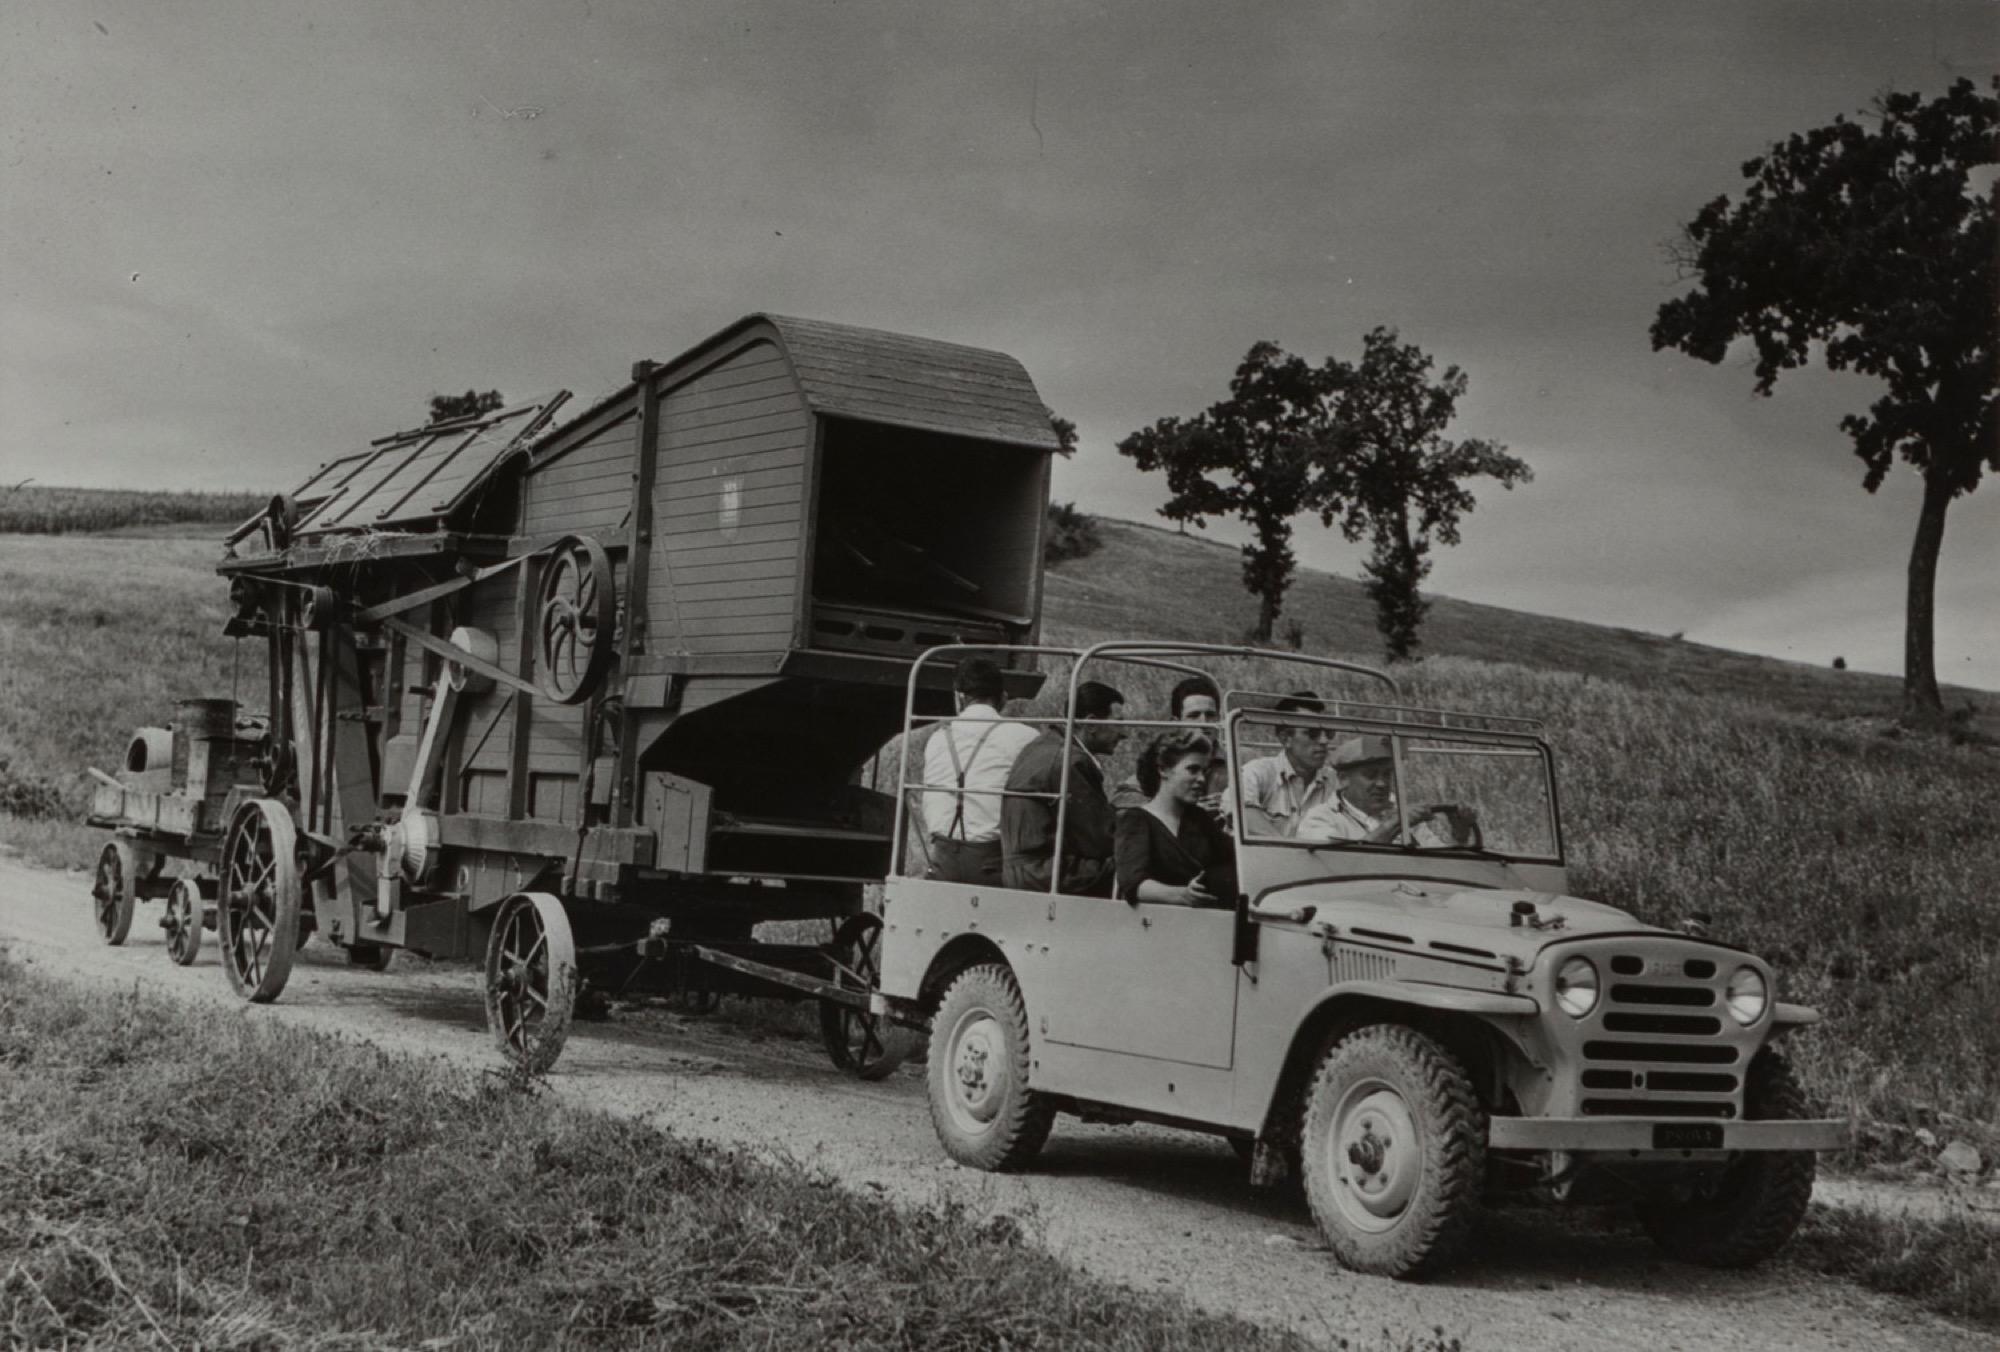 Riccardo Moncalvo (1915-2008) - Il lavoro nei campi, Langhe, years 1940 - Vintage [...]